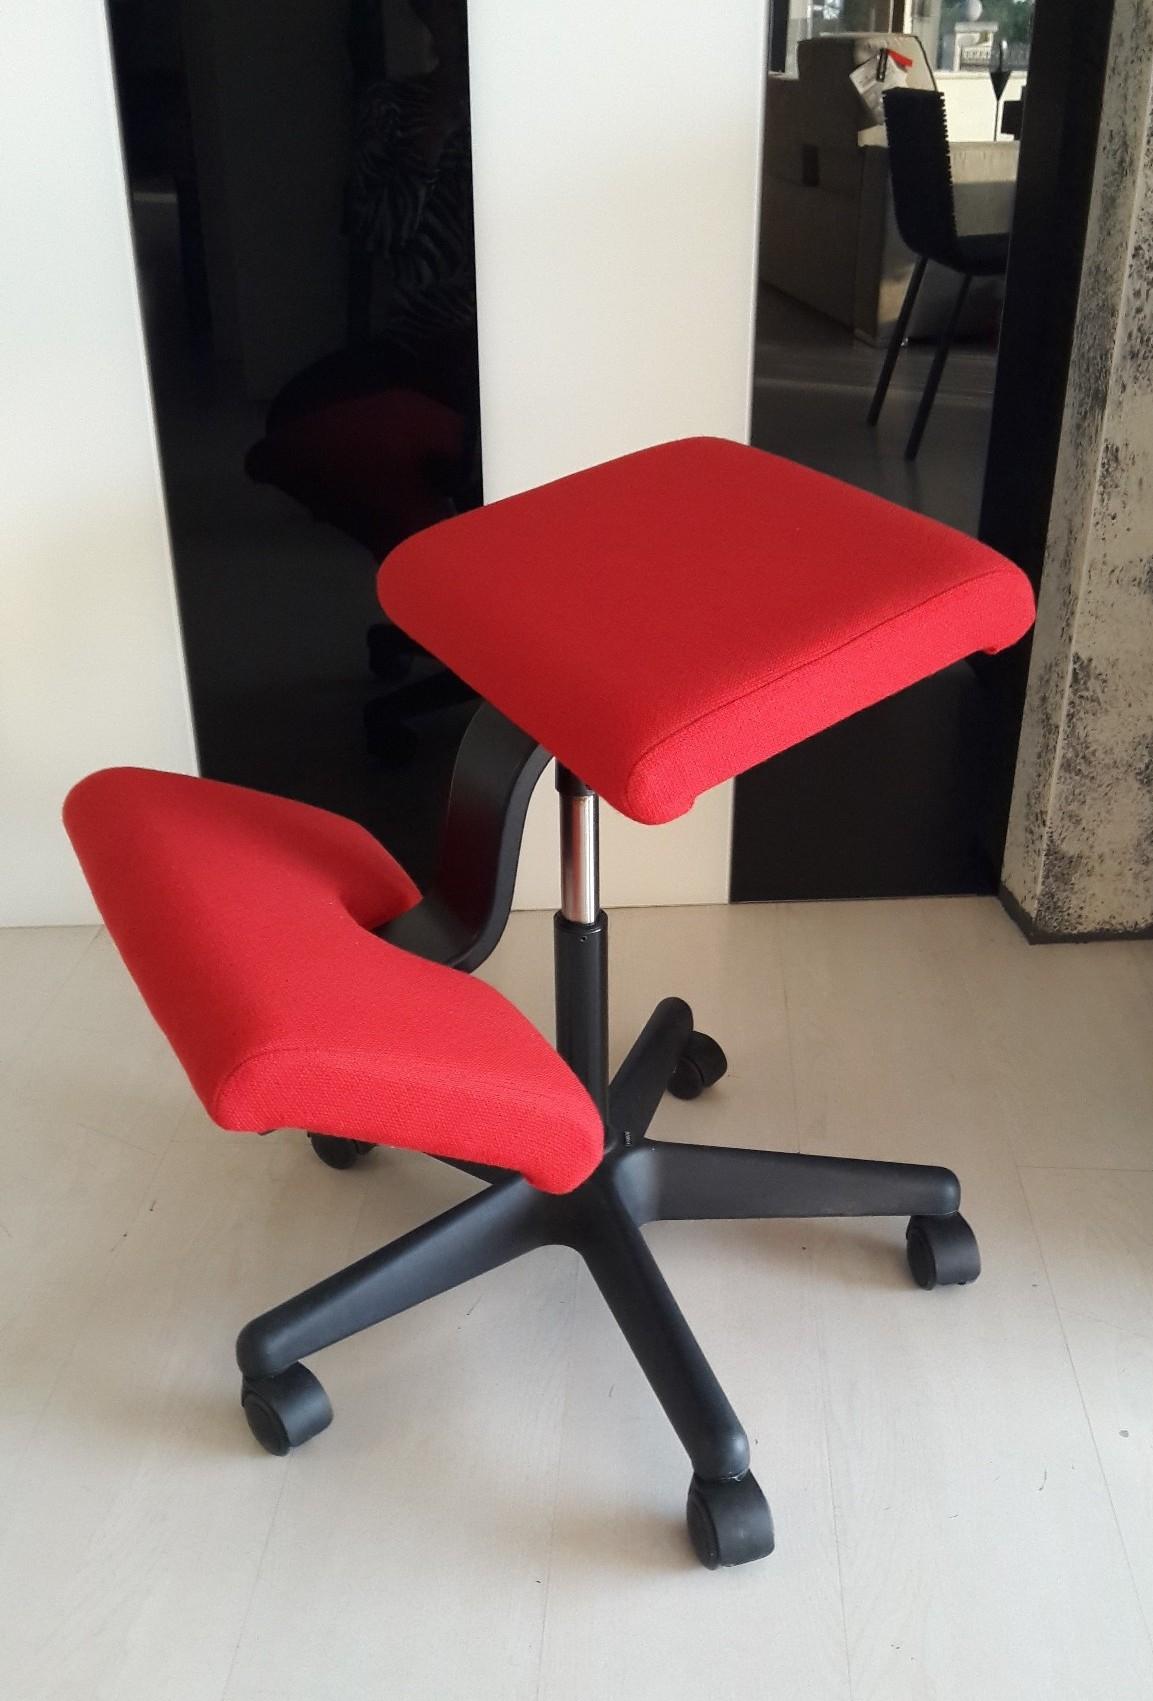 Sedie ergonomiche varier varier date colori standard with for Sedia ufficio varier